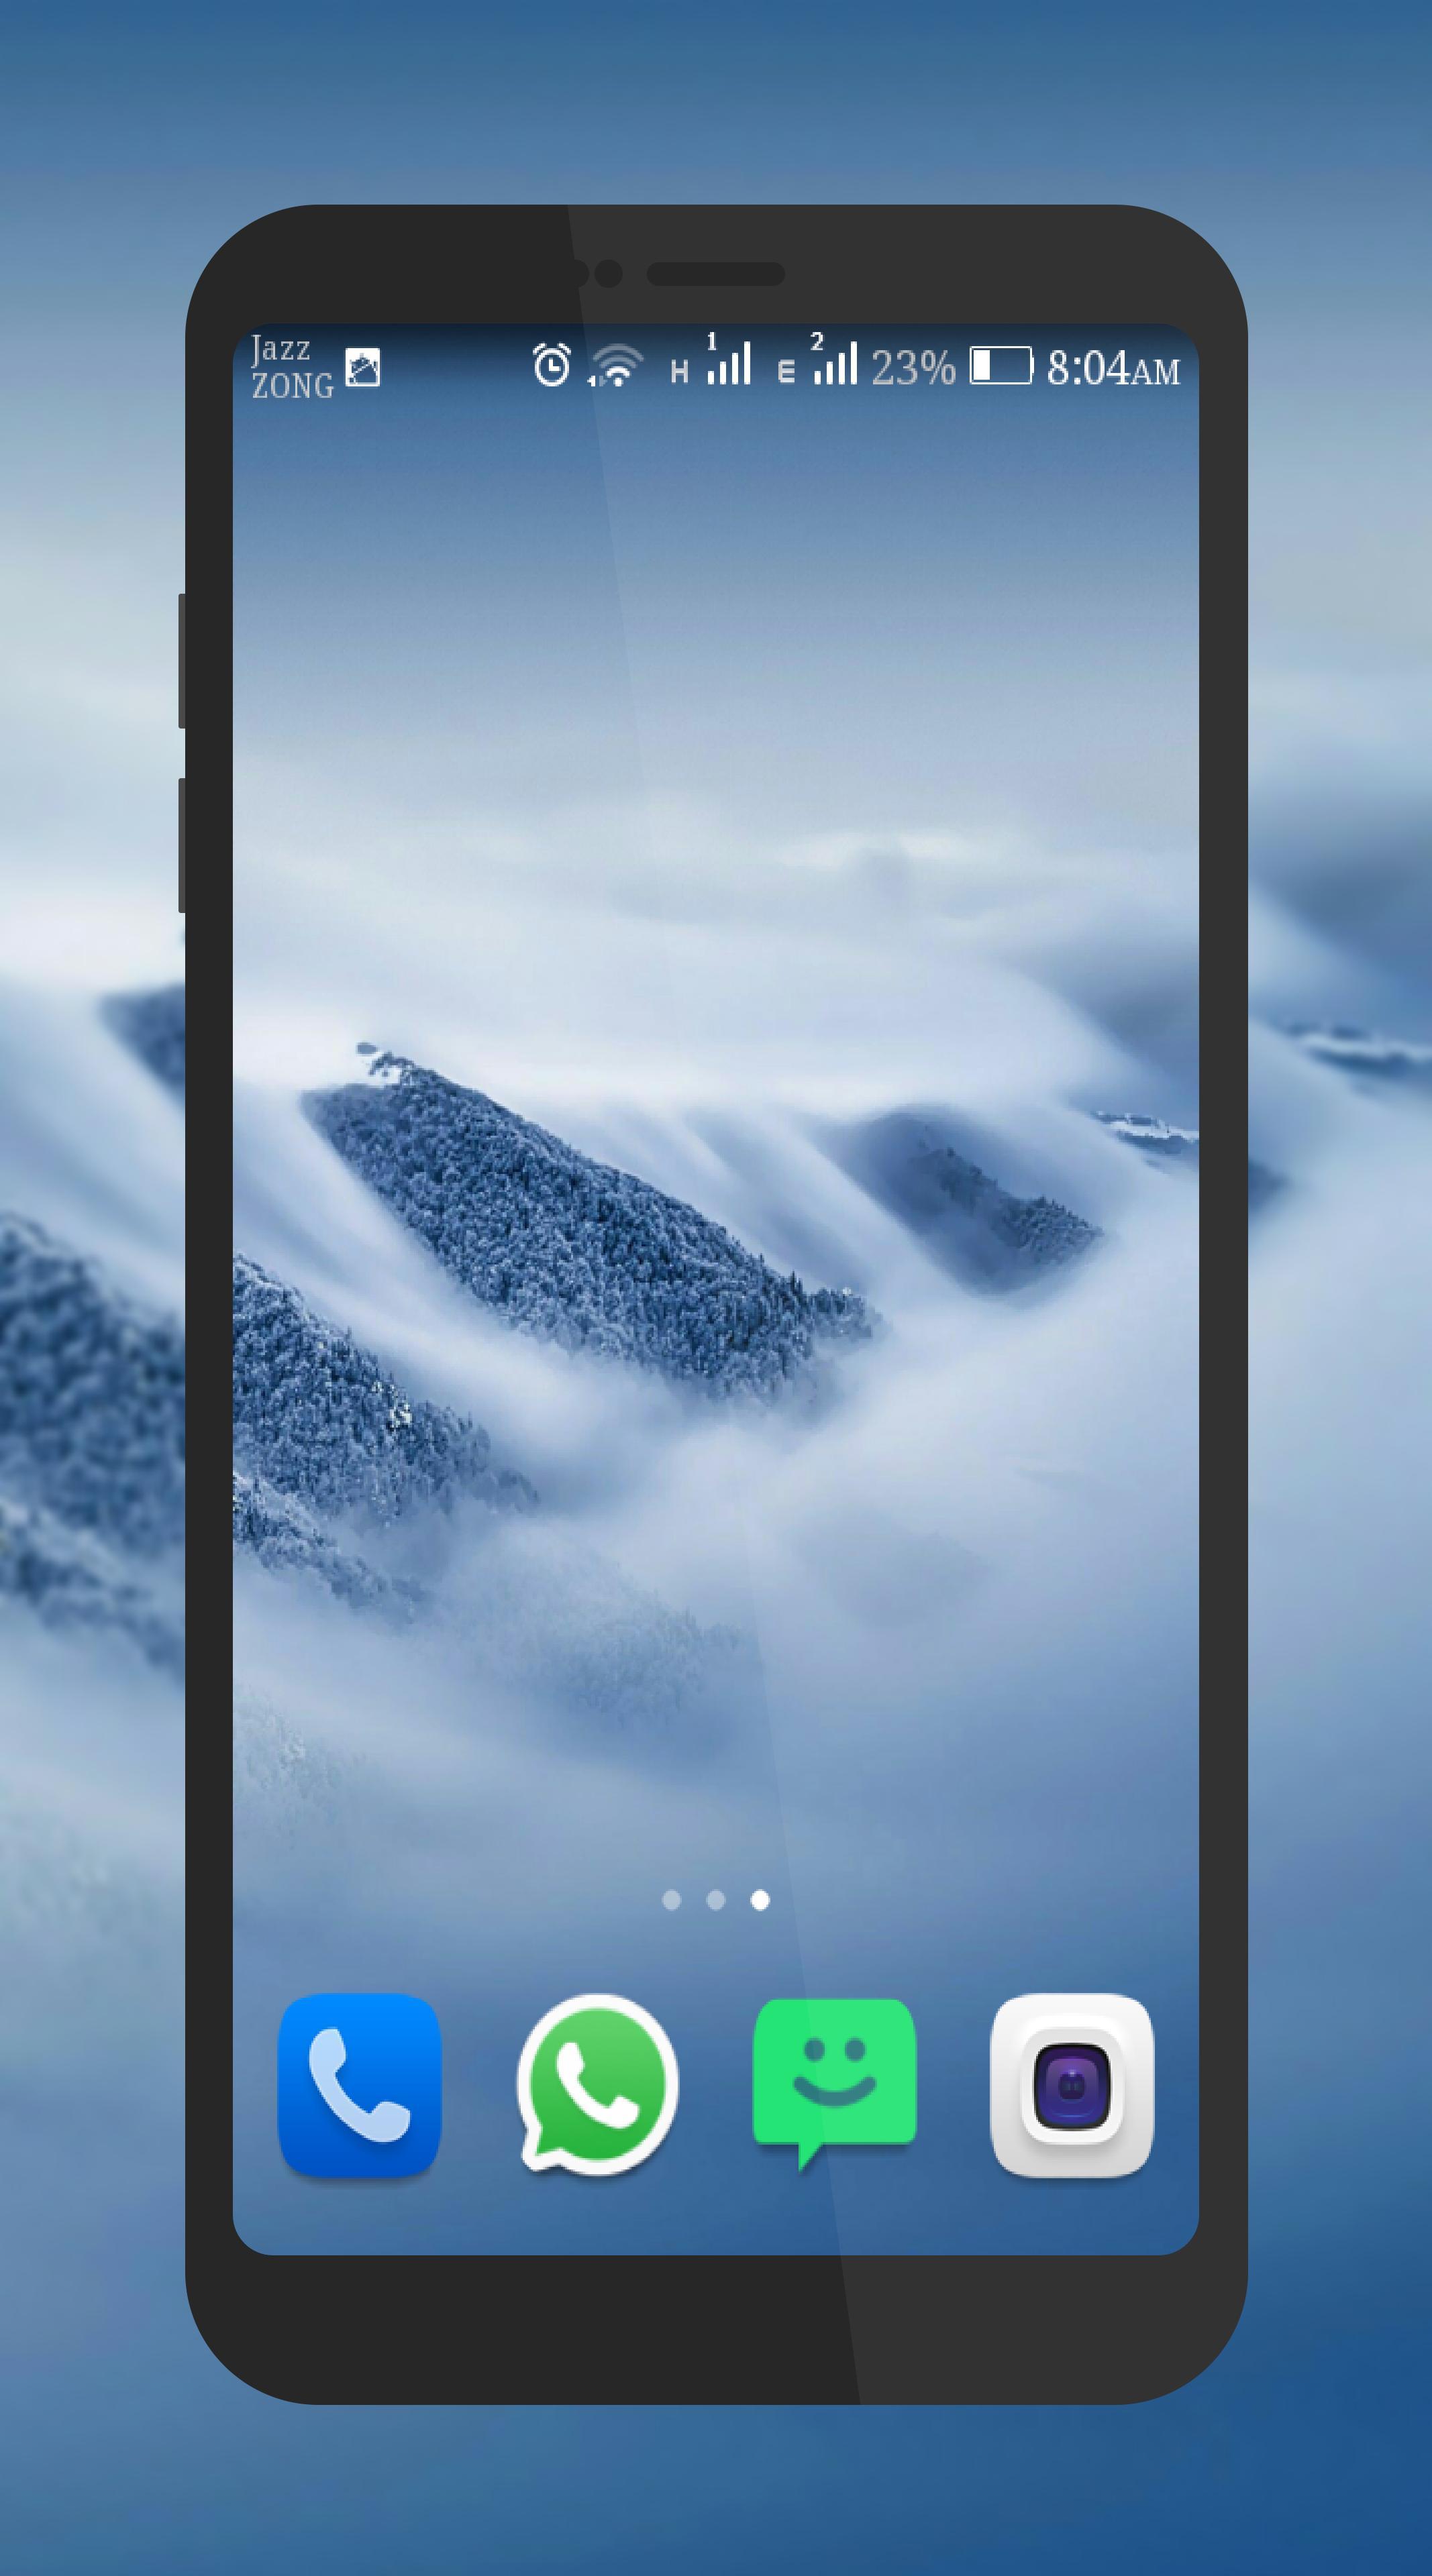 خلفيات رائعة ل Vivo V11 V11 Pro For Android Apk Download